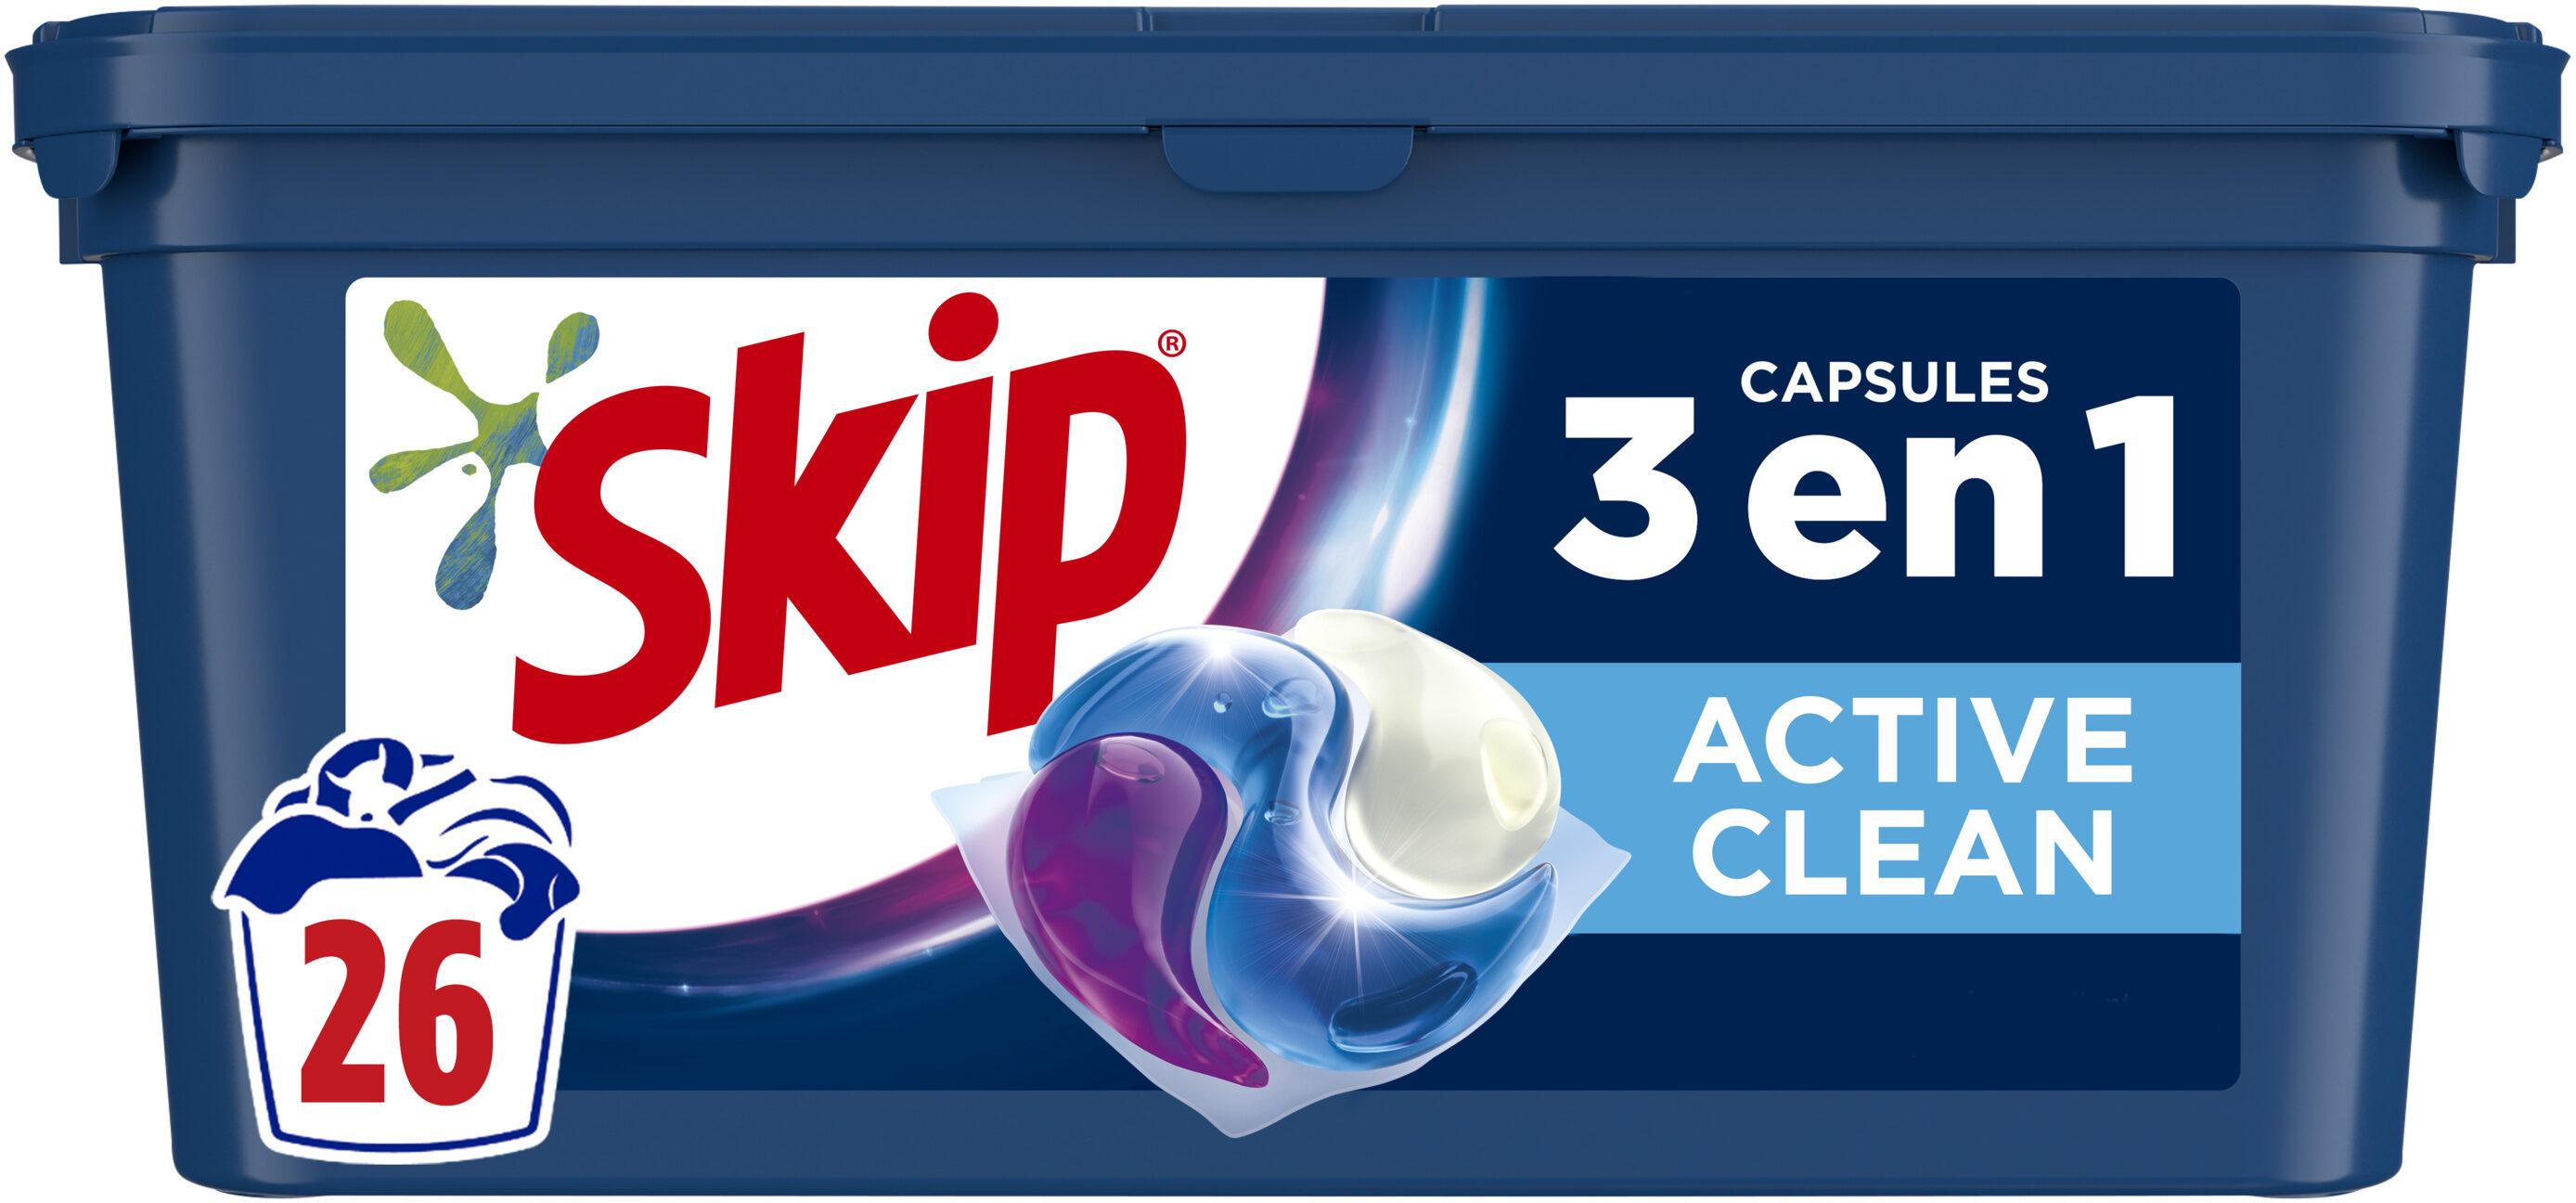 Skip 3en1 Lessive Capsules Active Clean 26 Capsules - Product - fr